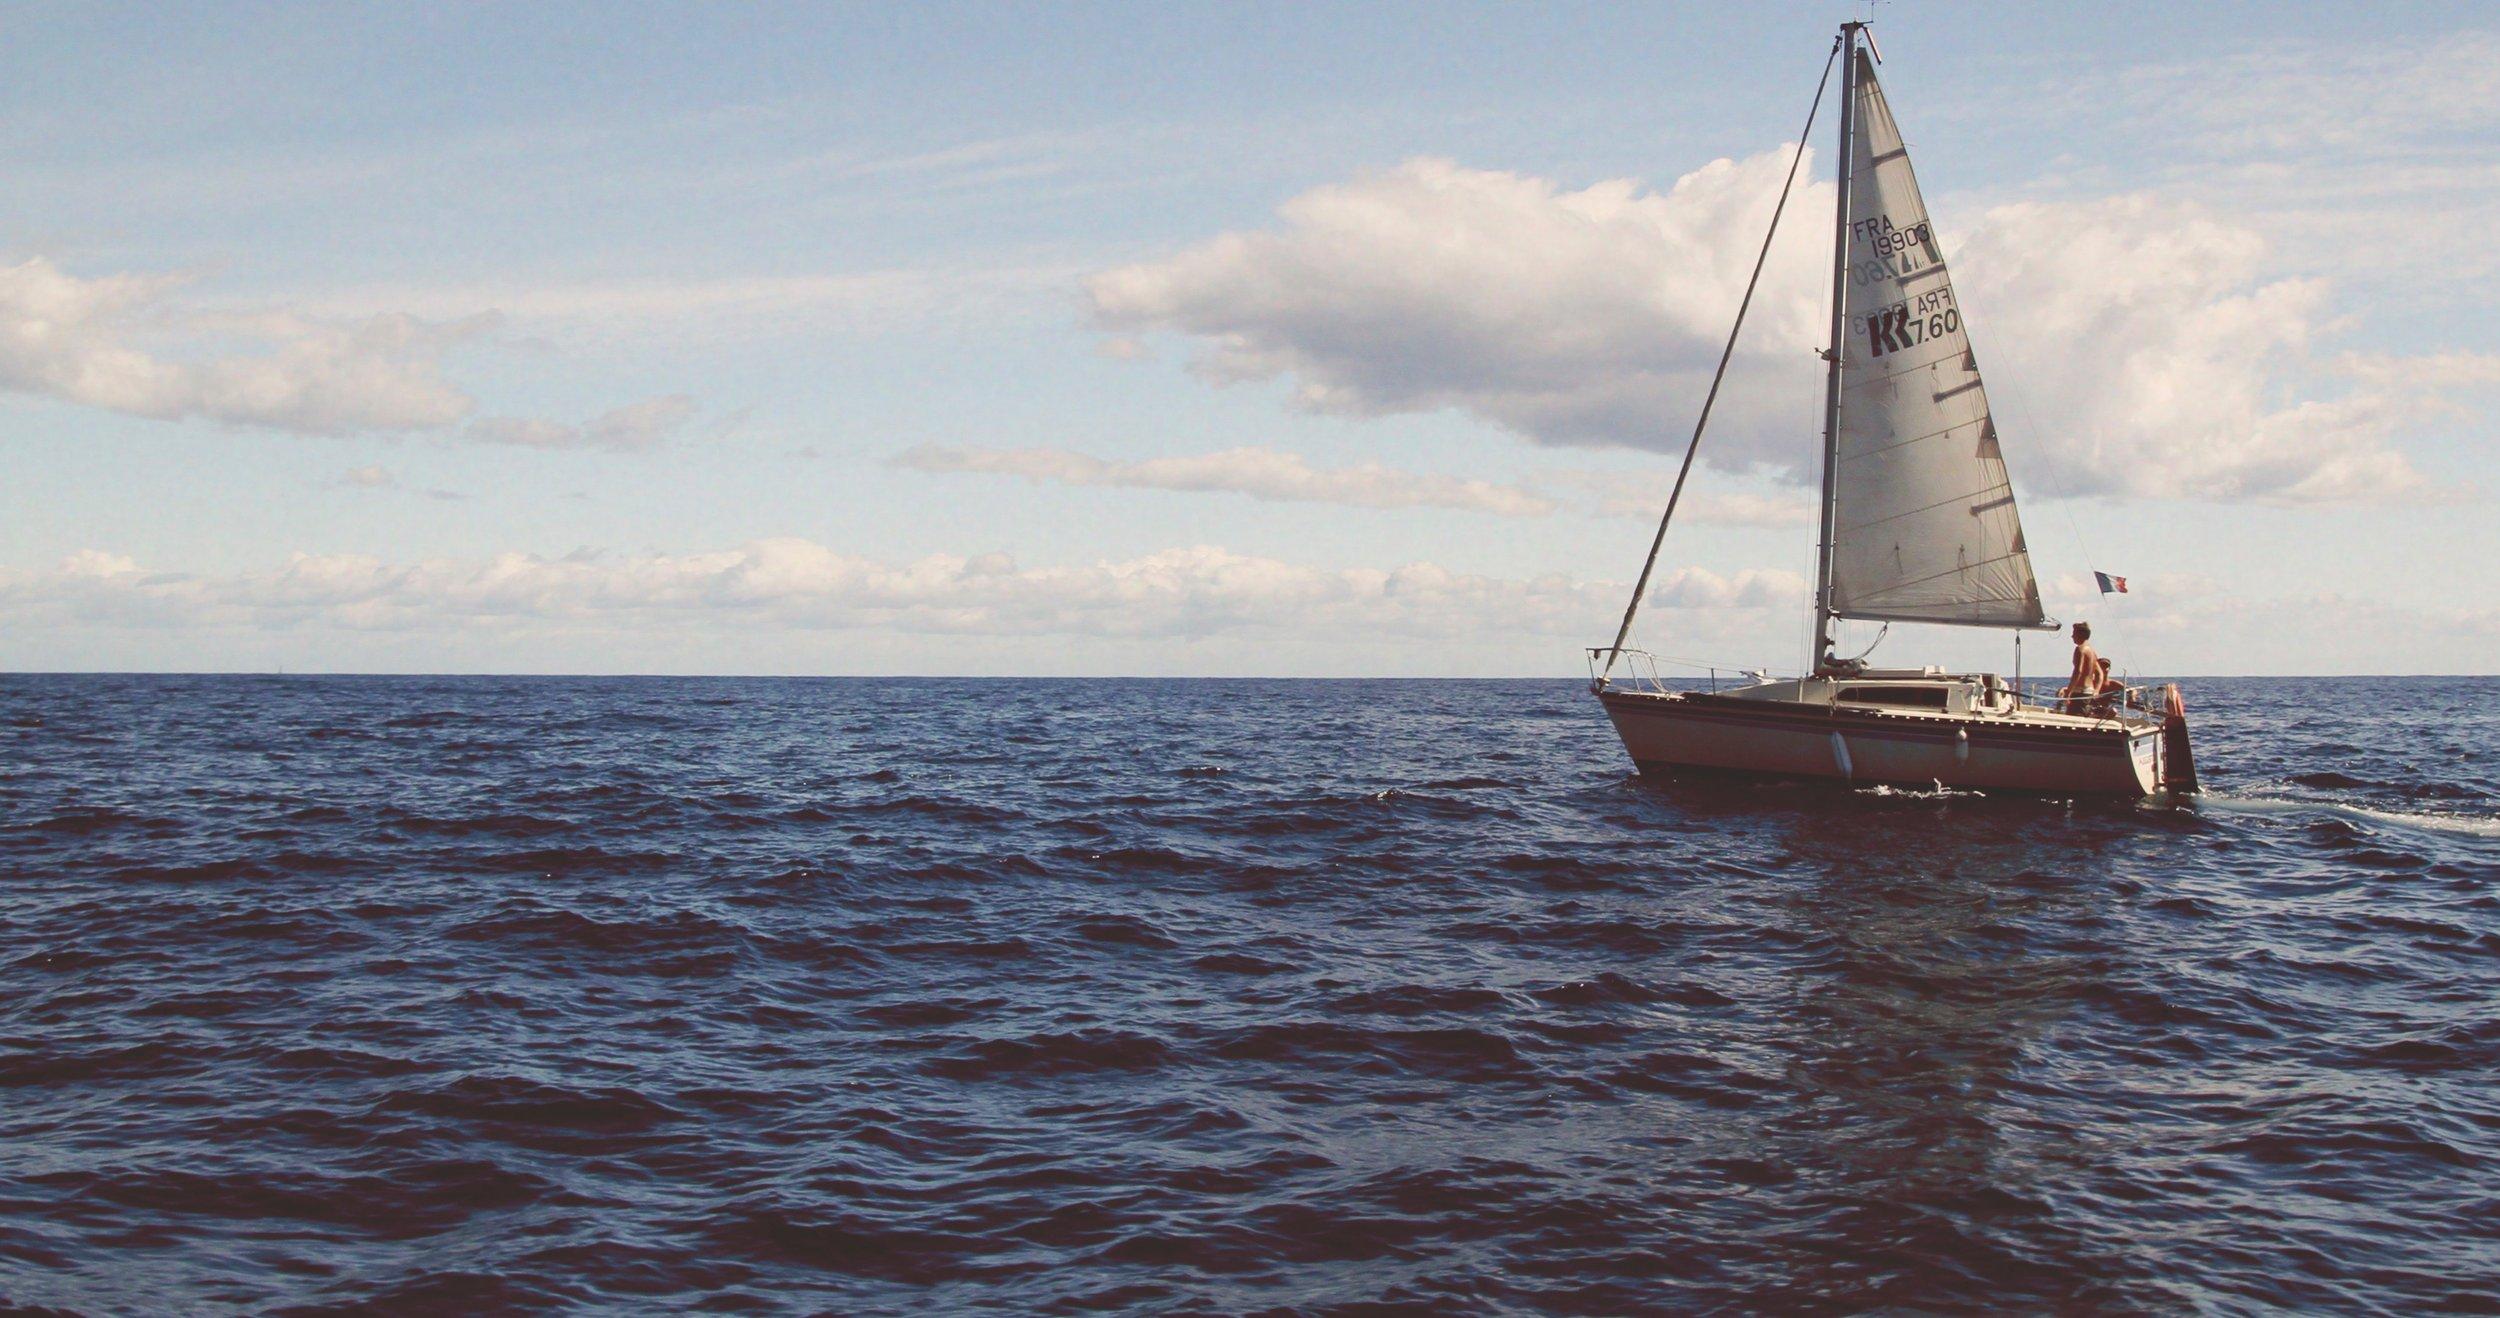 adventure-beach-boat-382167.jpg